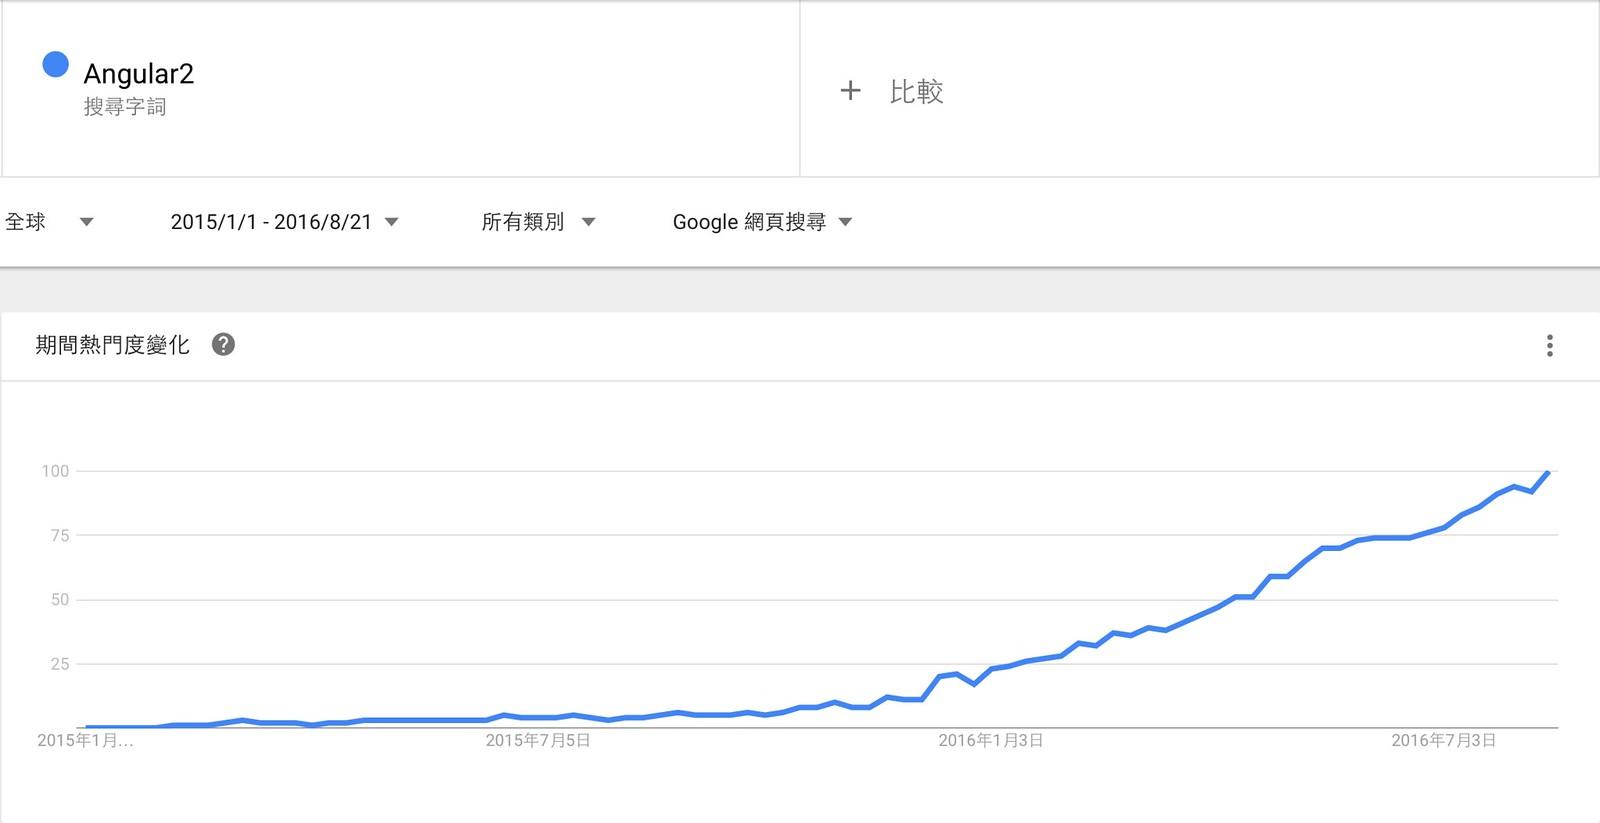 Angular2 Trends